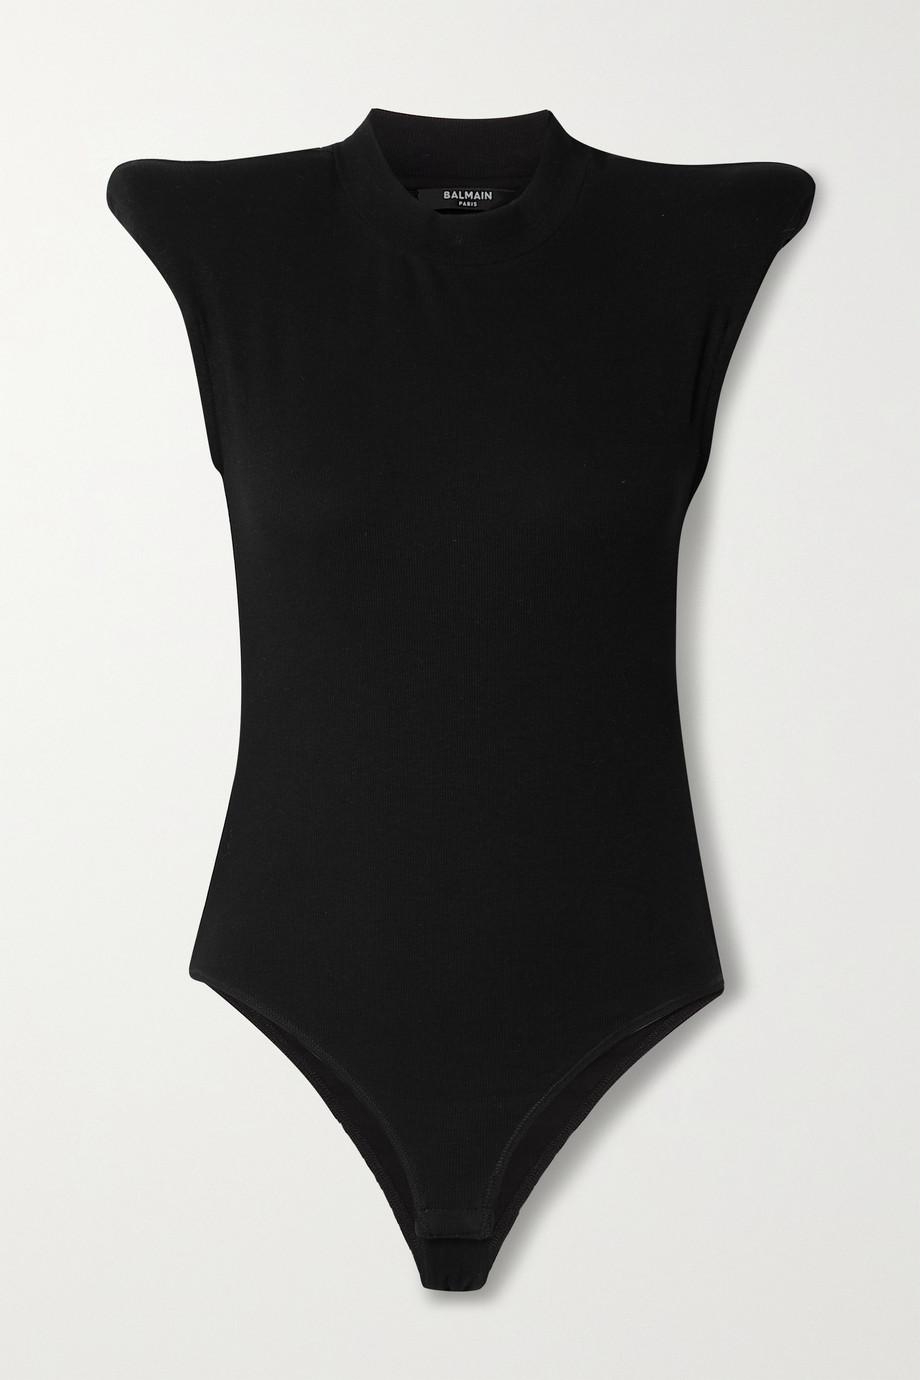 Balmain Ribbed stretch-cotton jersey bodysuit